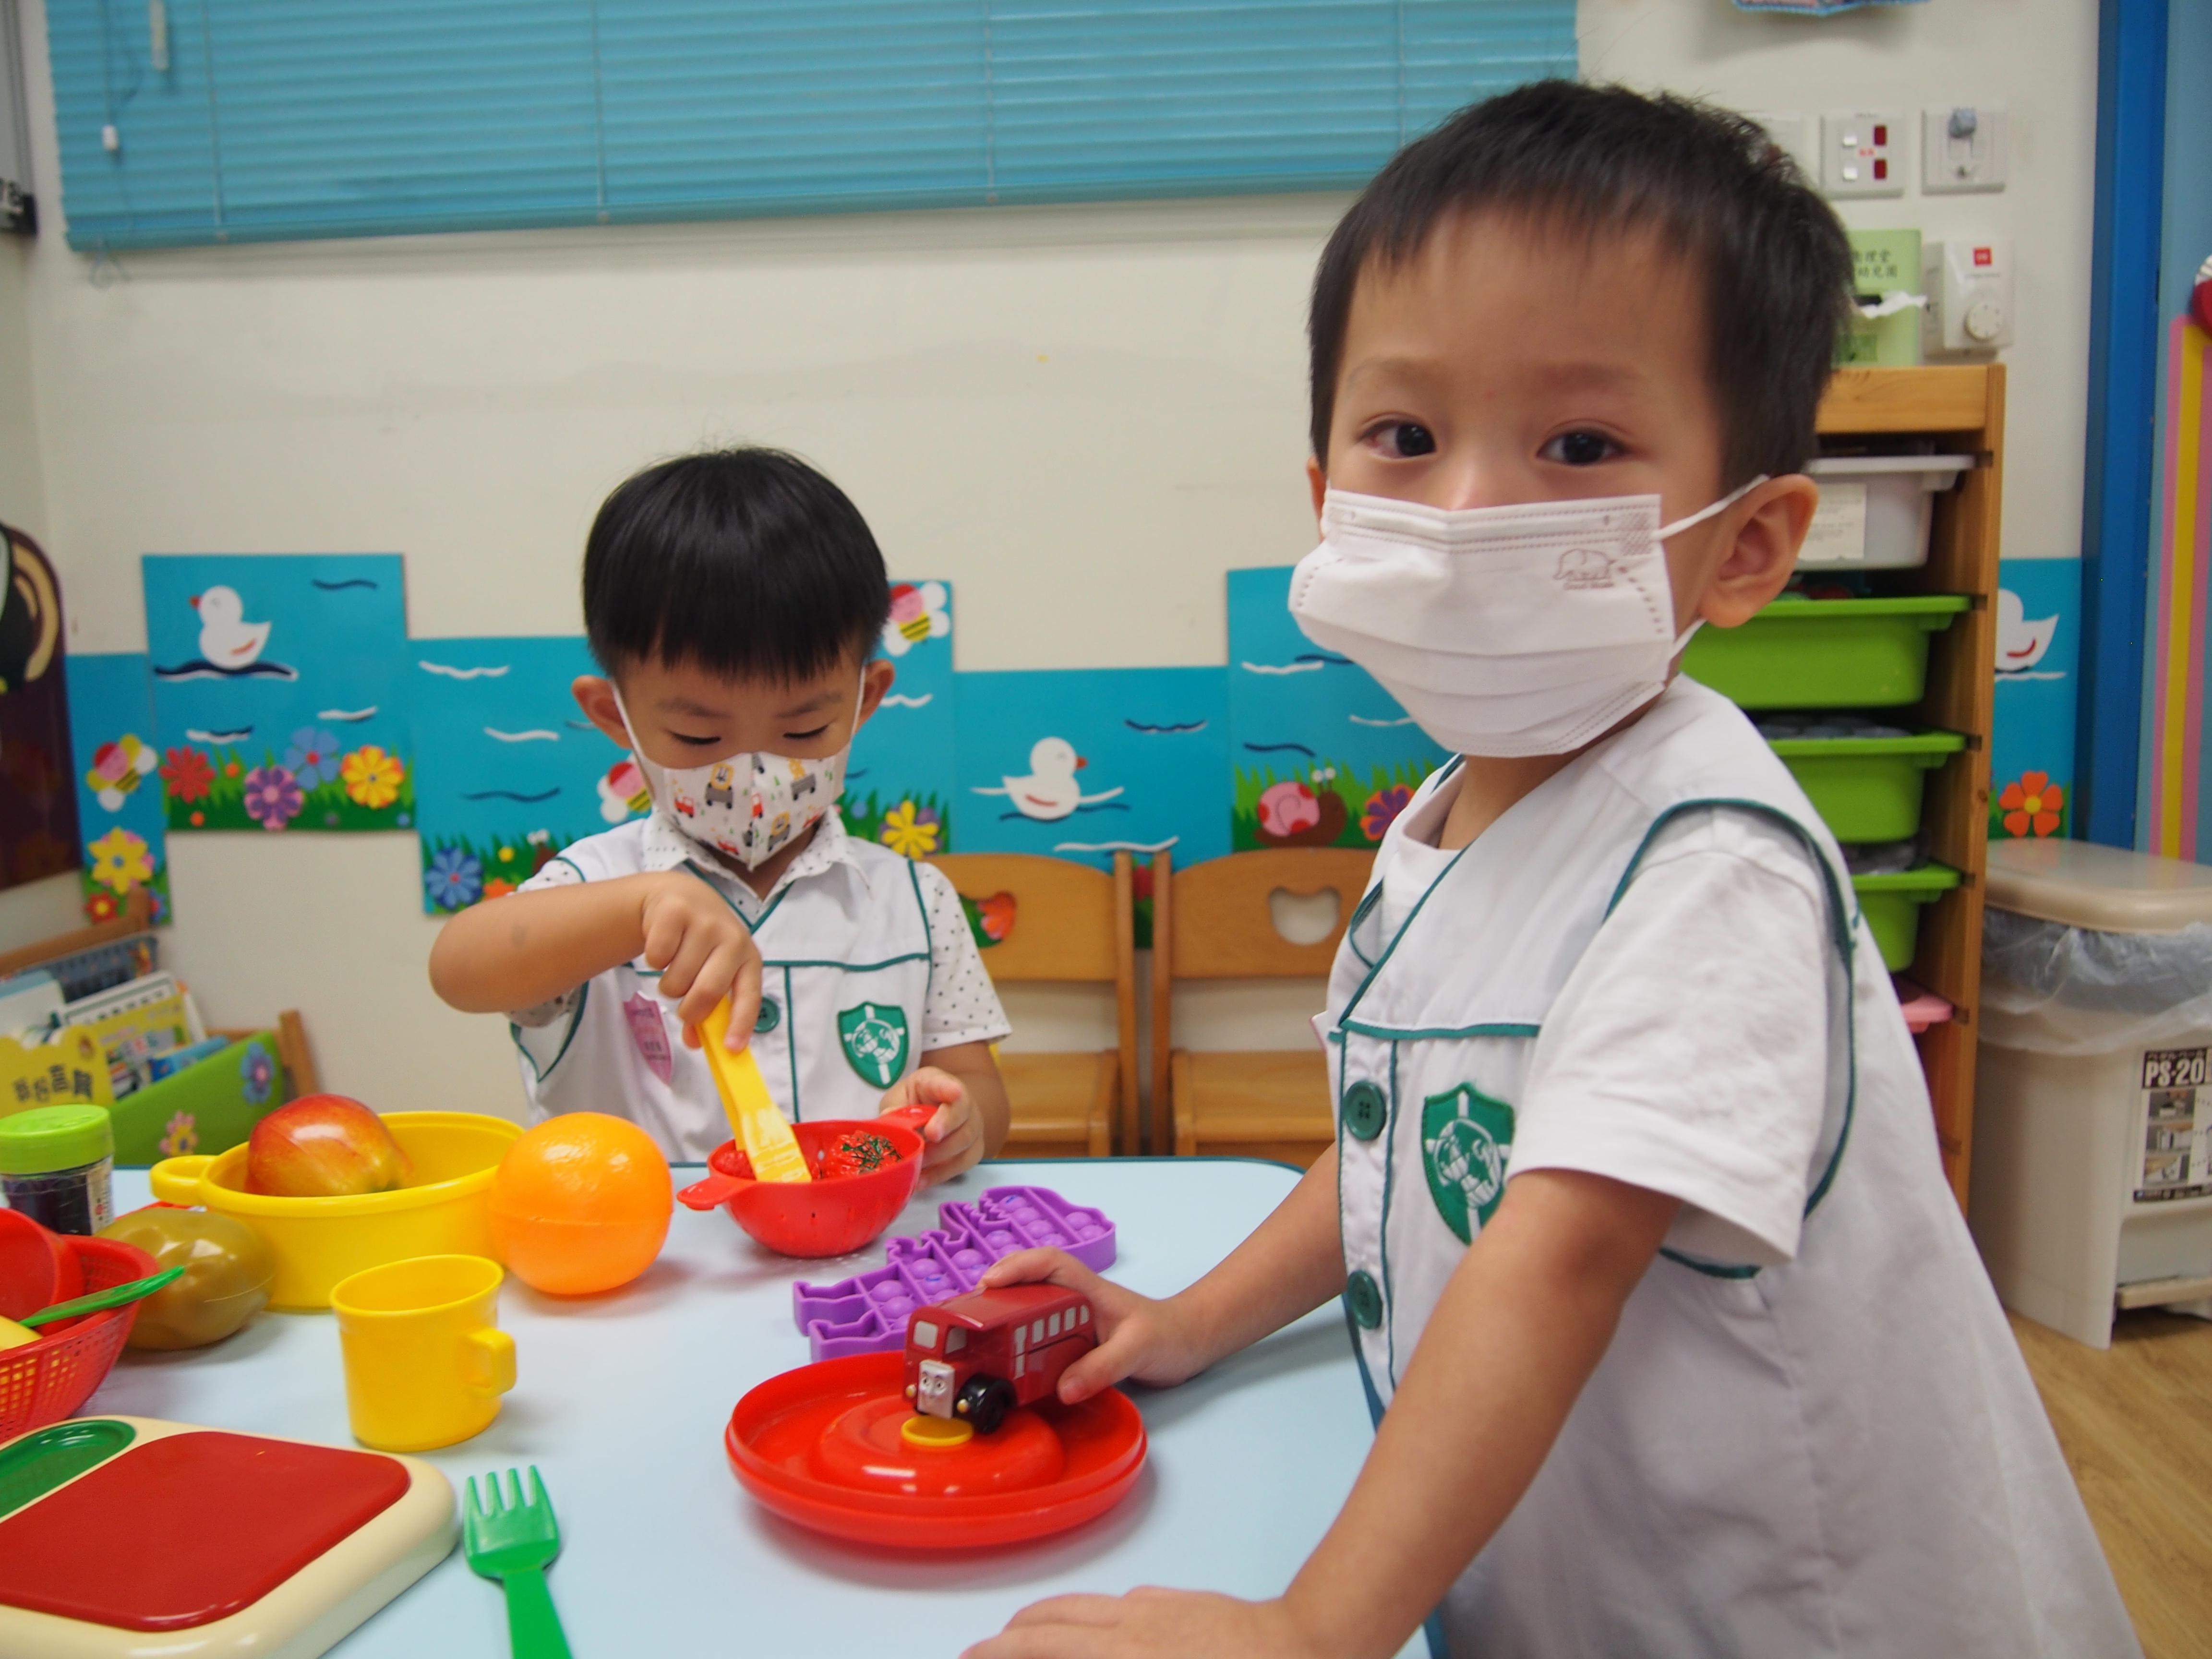 http://npmc.edu.hk/sites/default/files/p8180036.jpg